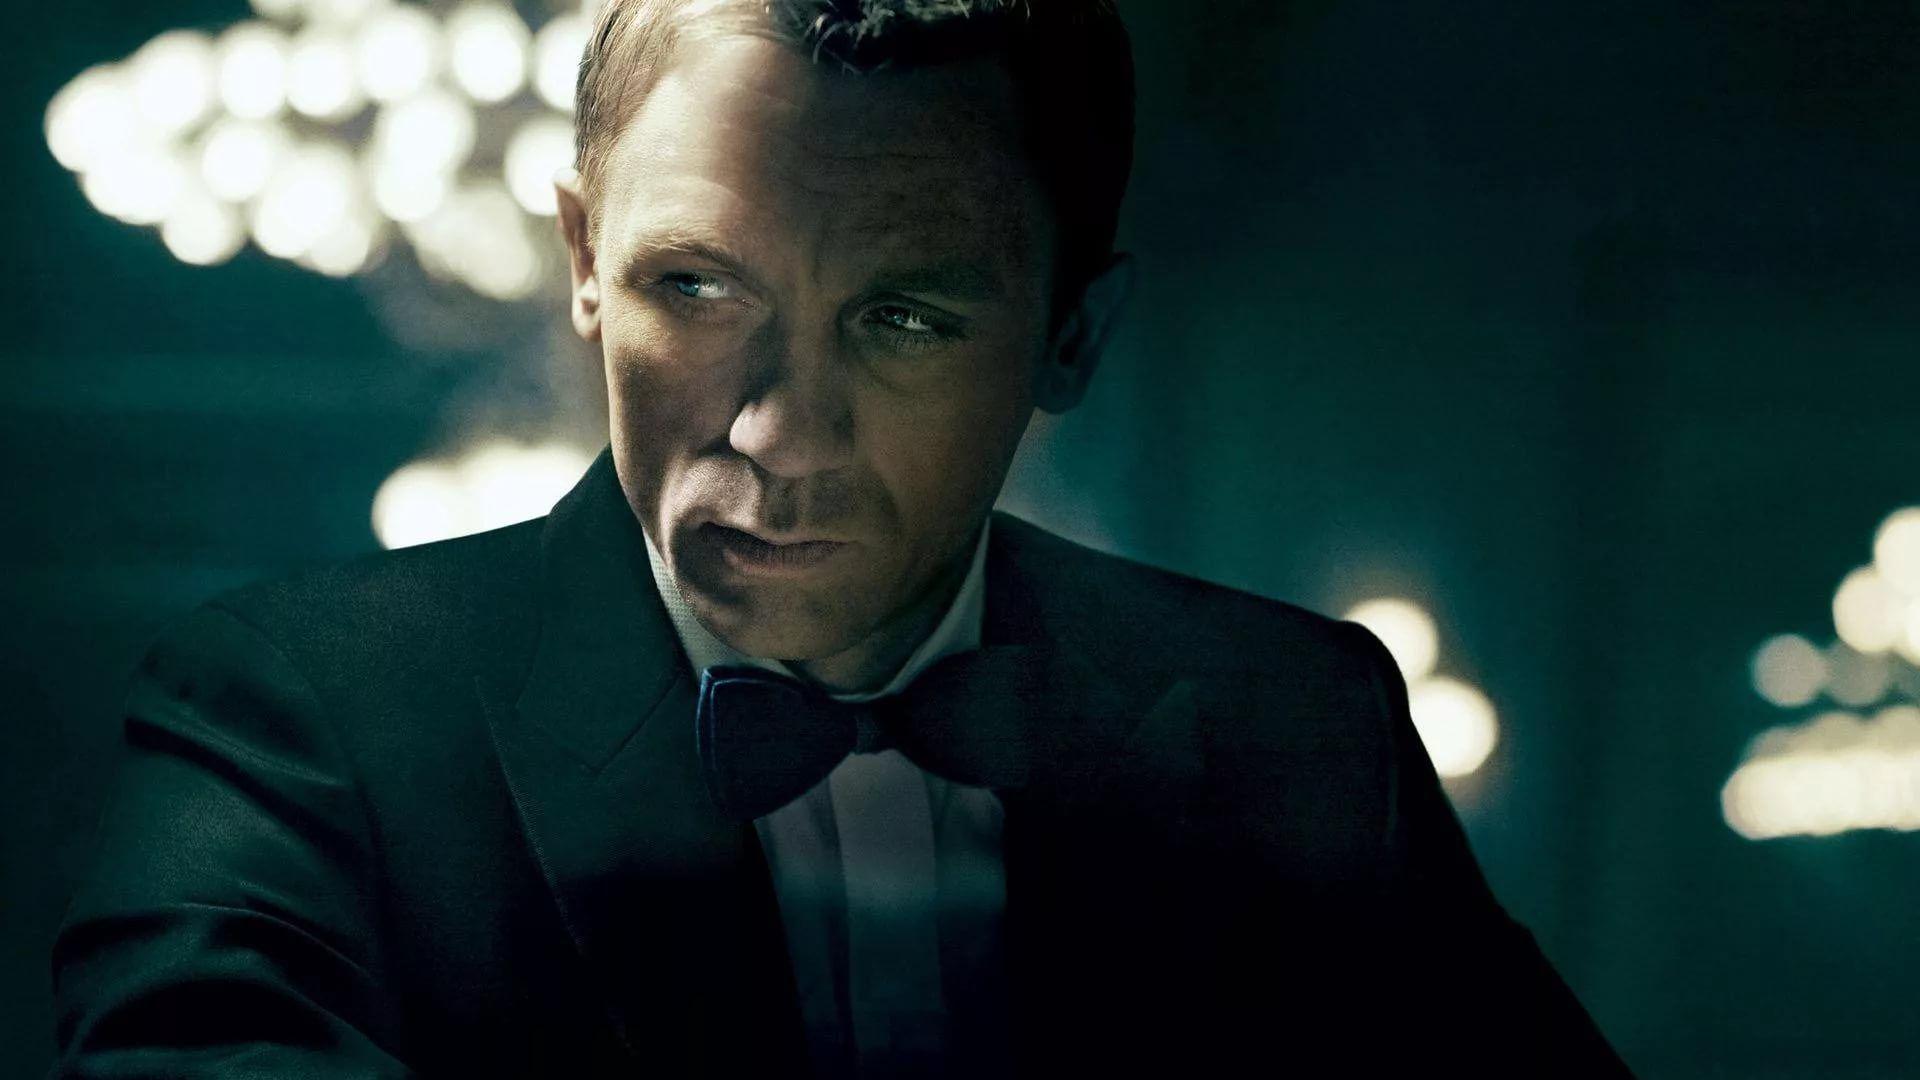 James Bond wallpaper download